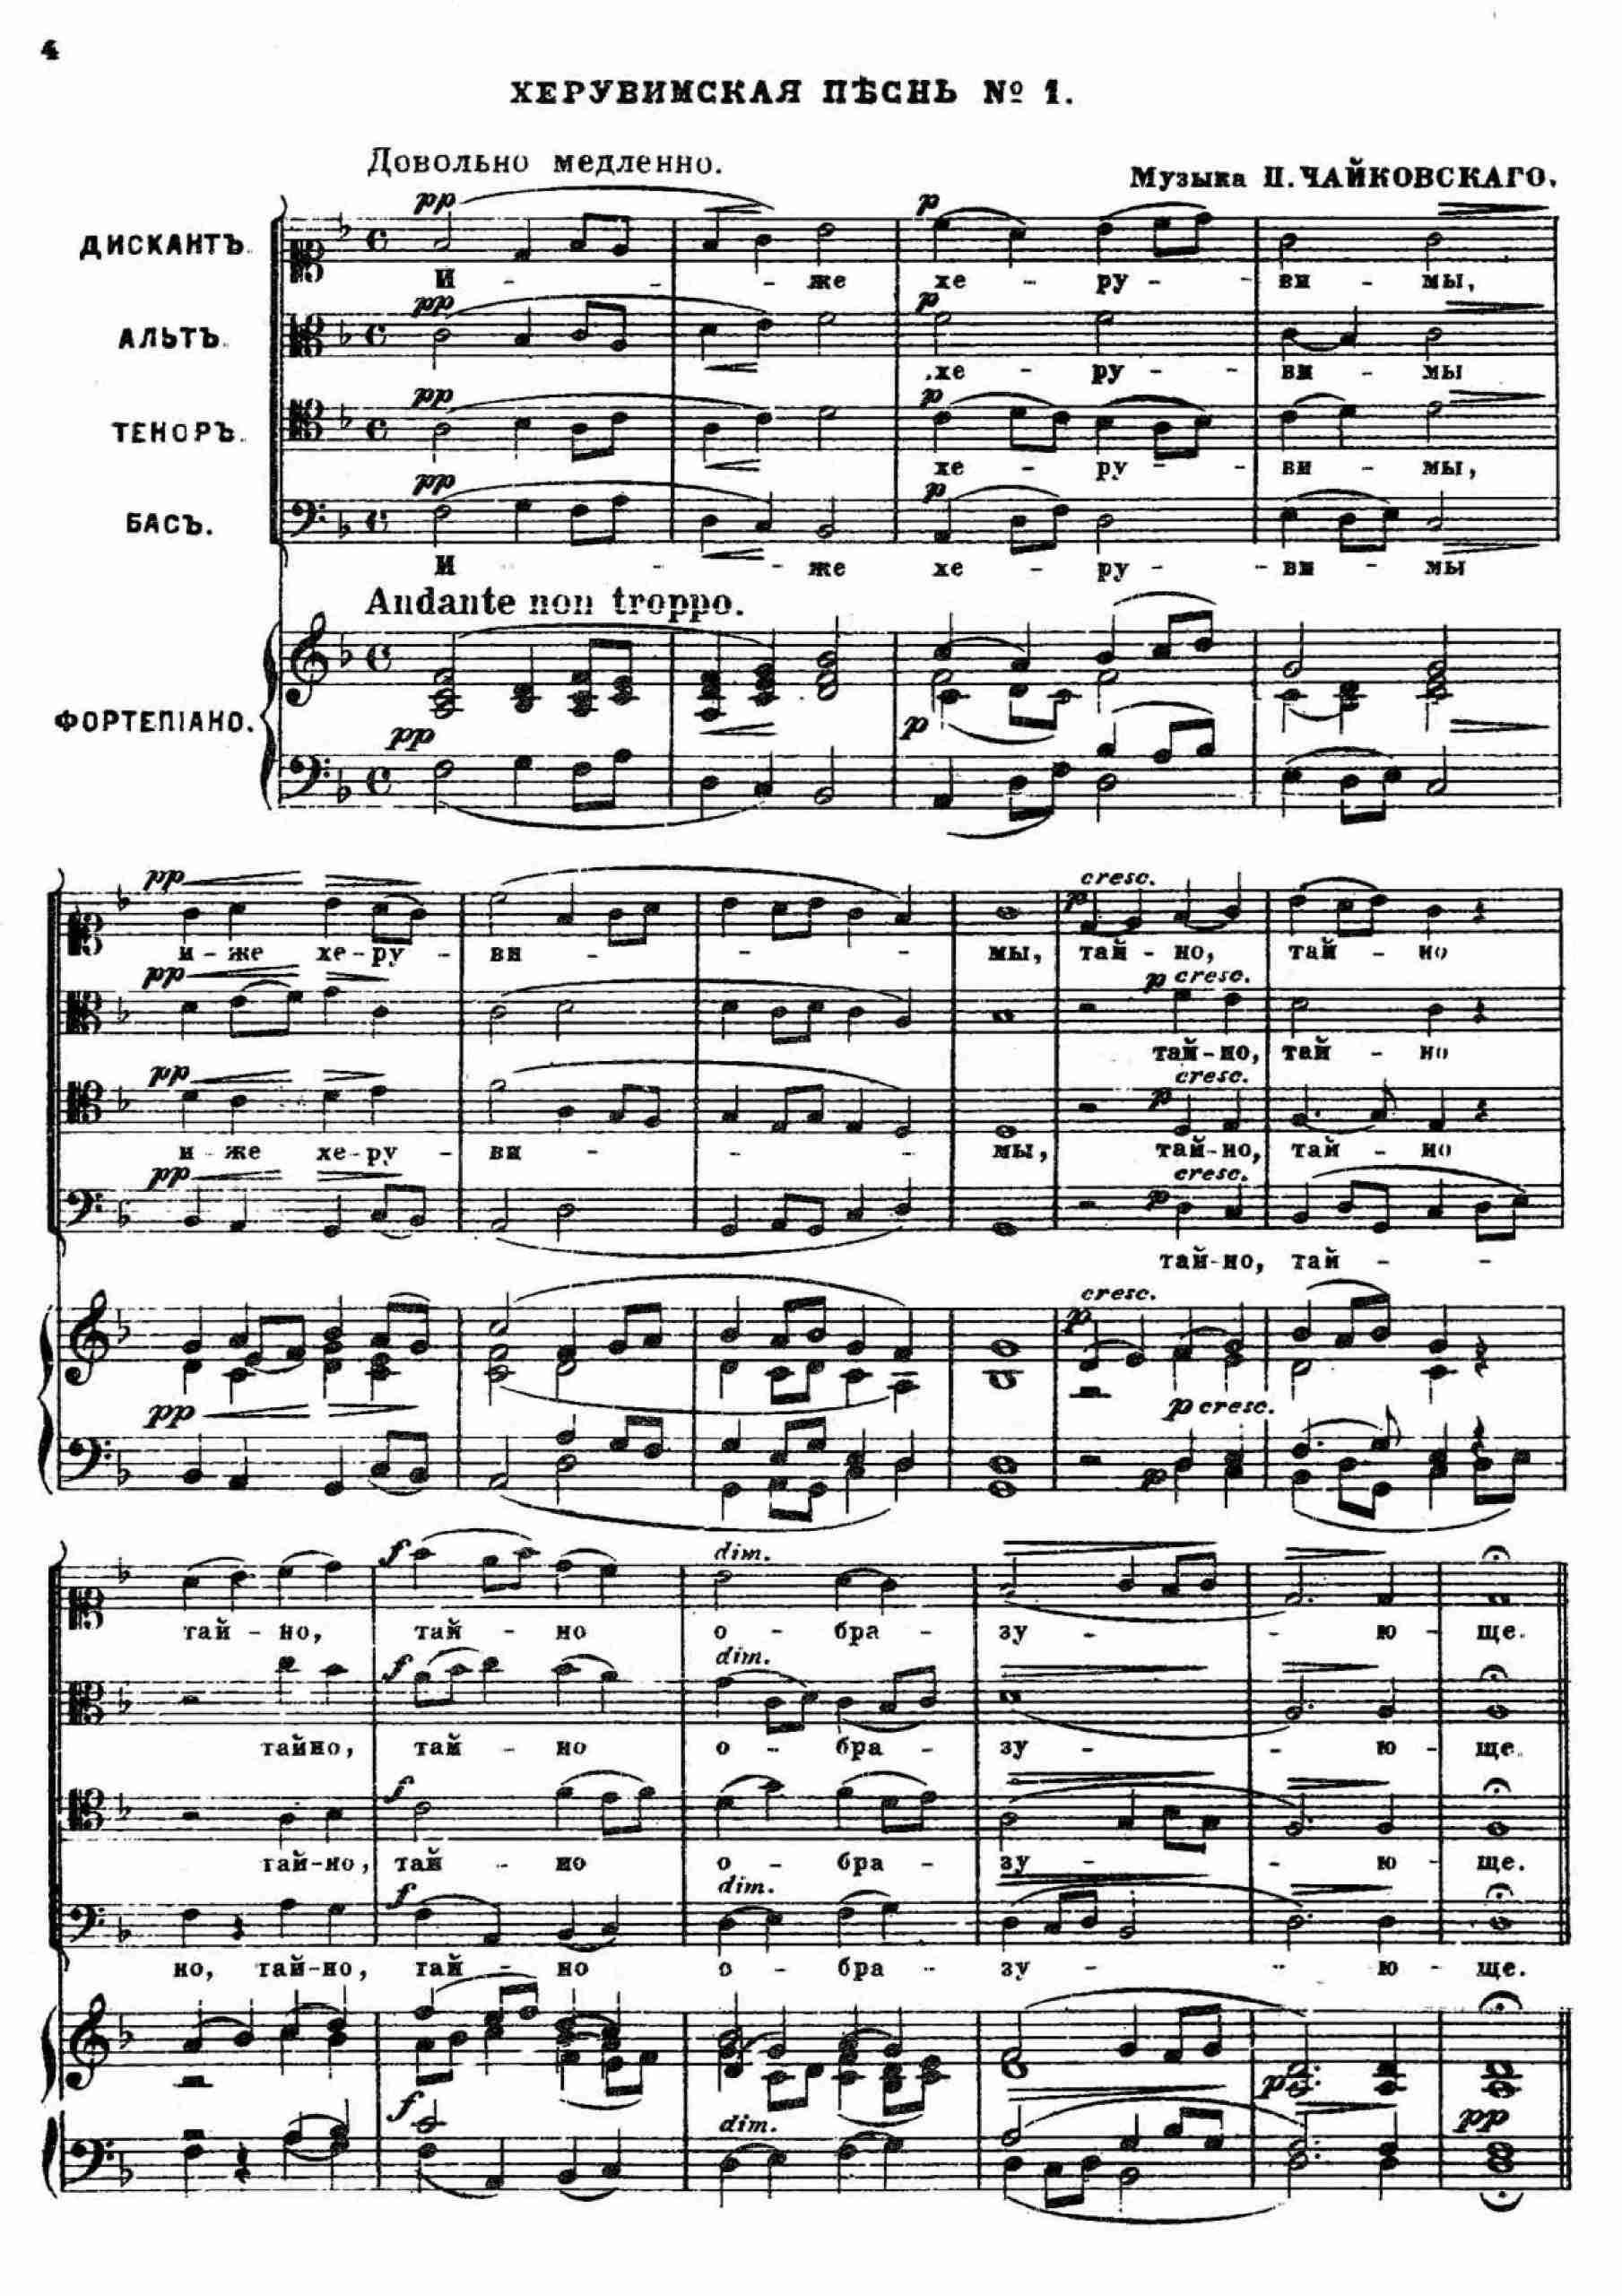 Tchaikovsky, Pyotr - 9 Sacred Pieces